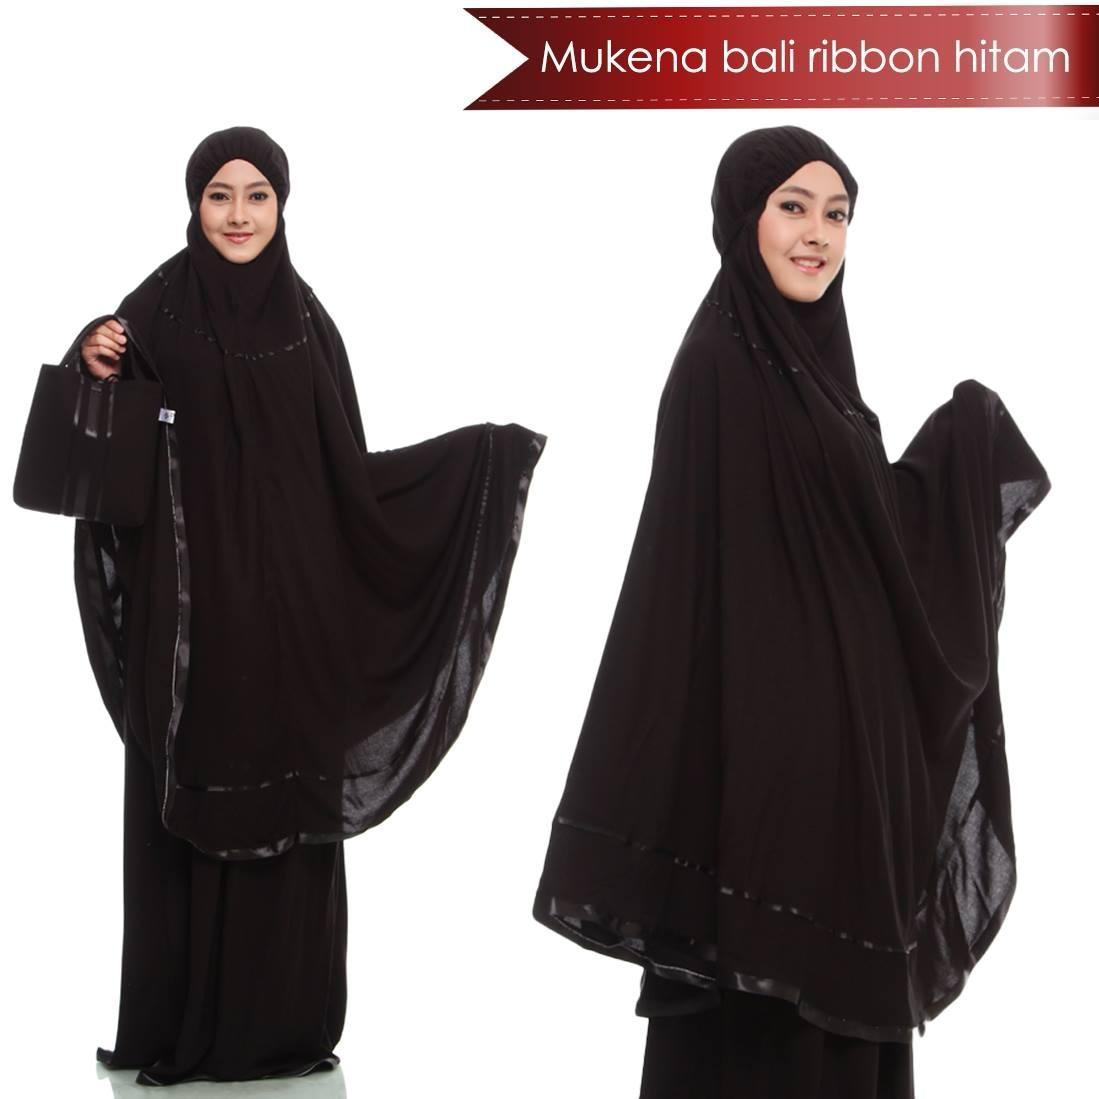 Mukena Bali Ribon Polos Hitam